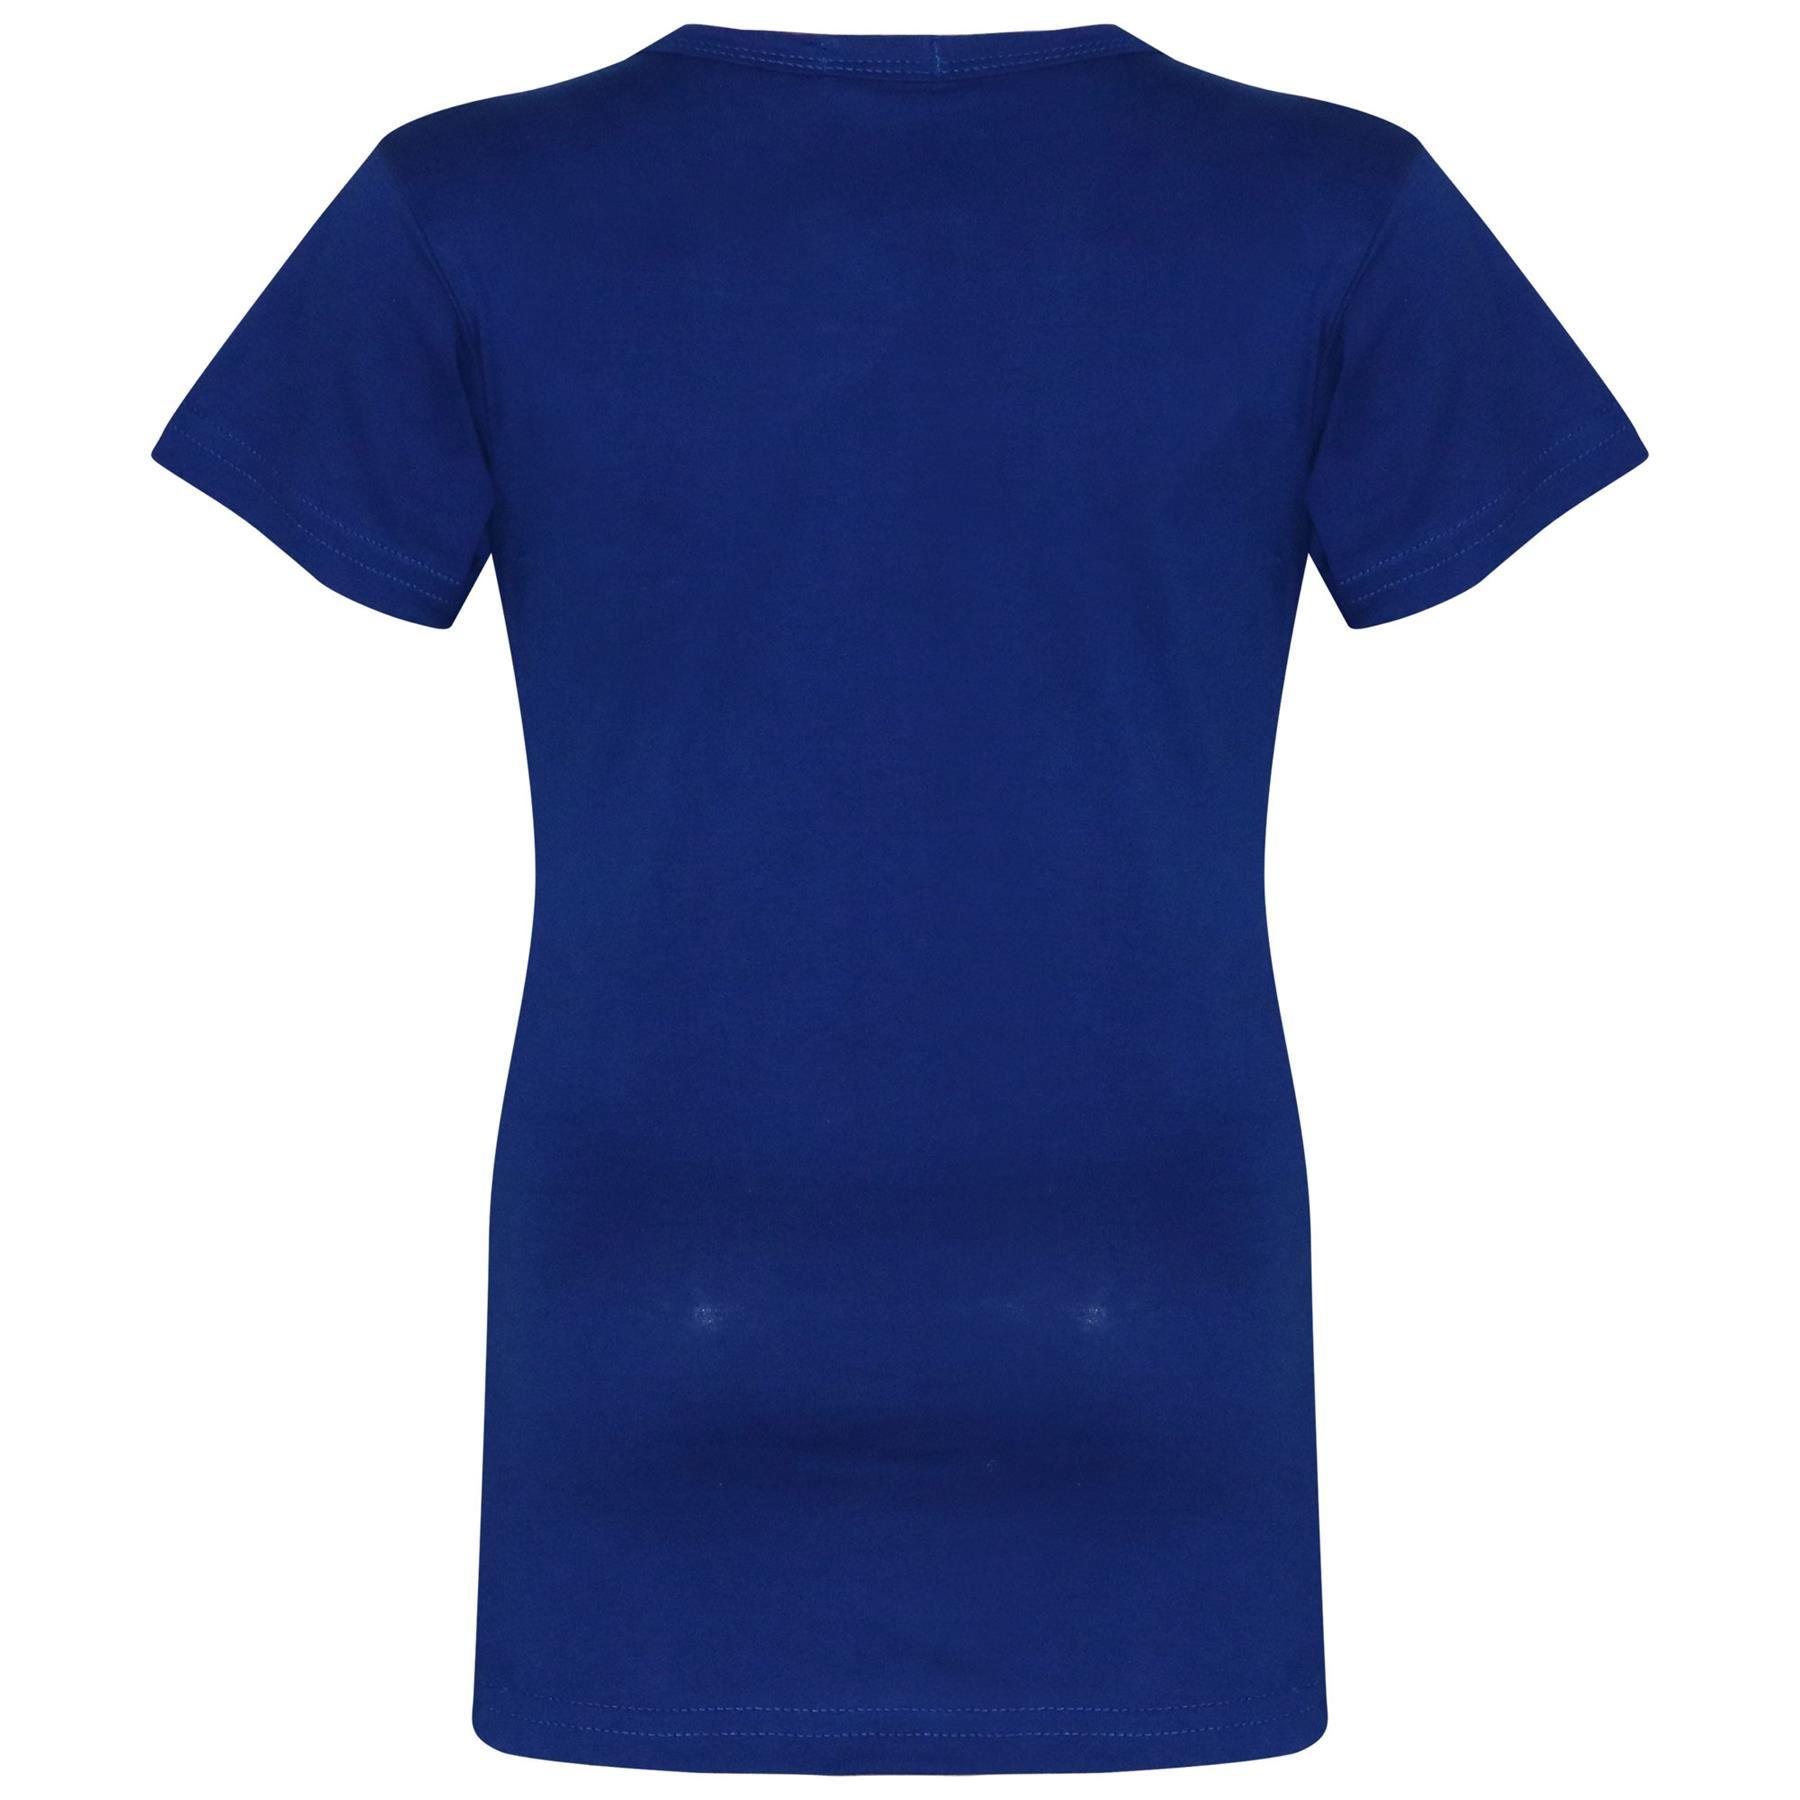 Kids-Girls-T-Shirts-Designer-100-Cotton-Plain-School-T-Shirt-Top-New-Age-3-13Yr thumbnail 36